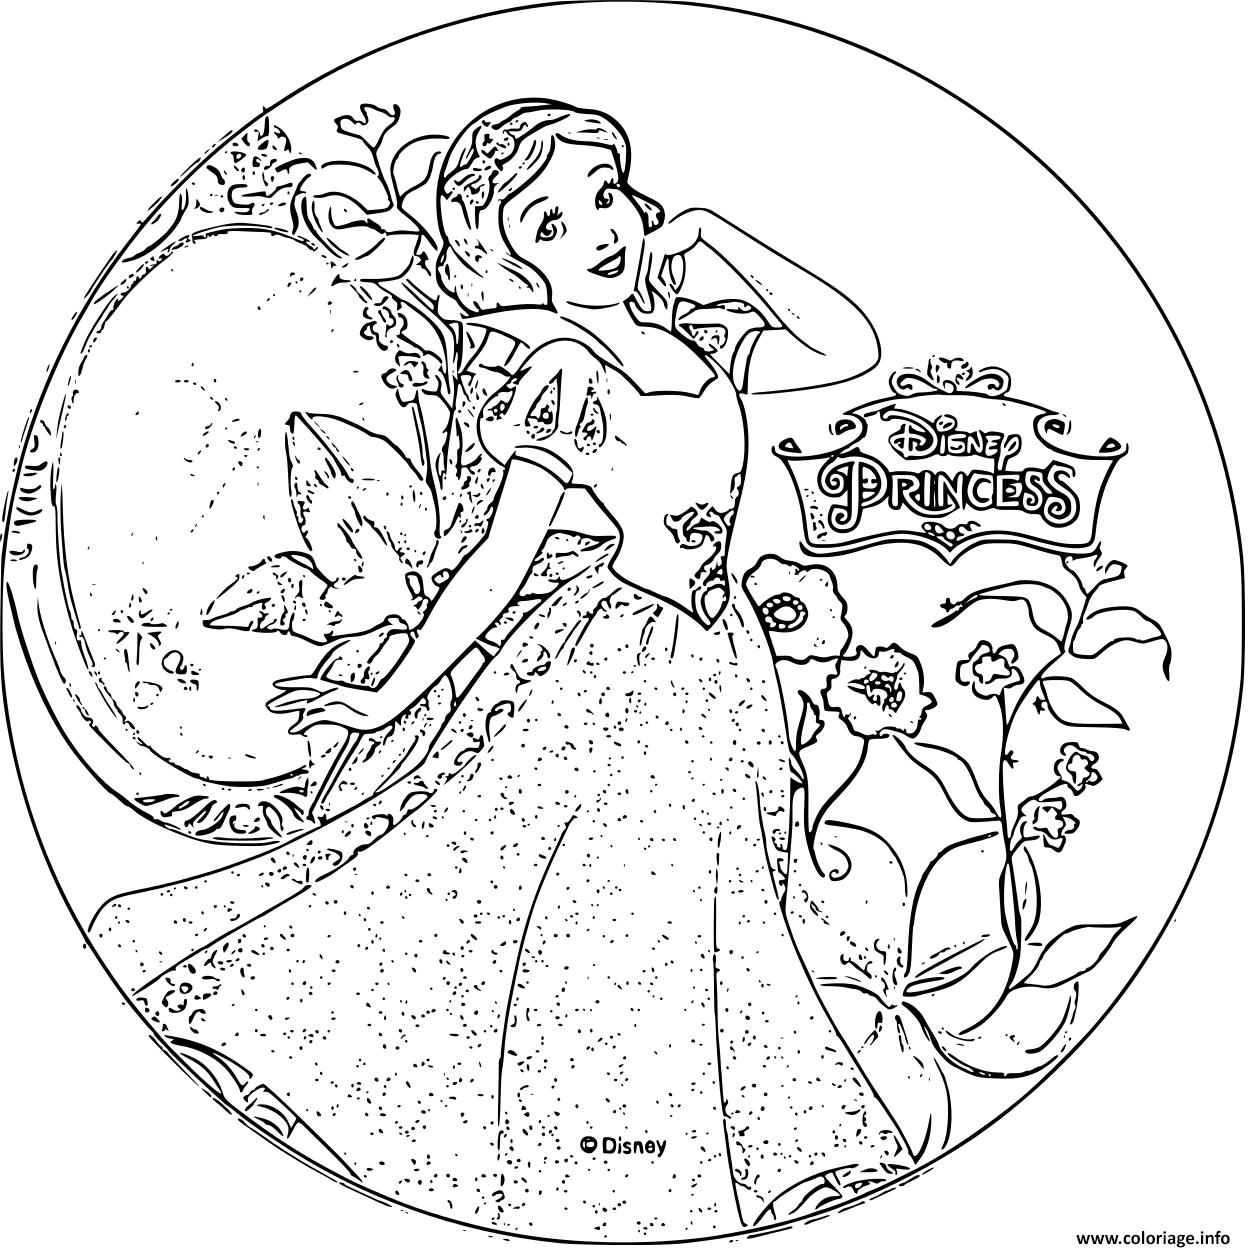 Coloriage Disney Princesse Blanche Neige 1937 Jecolorie Com